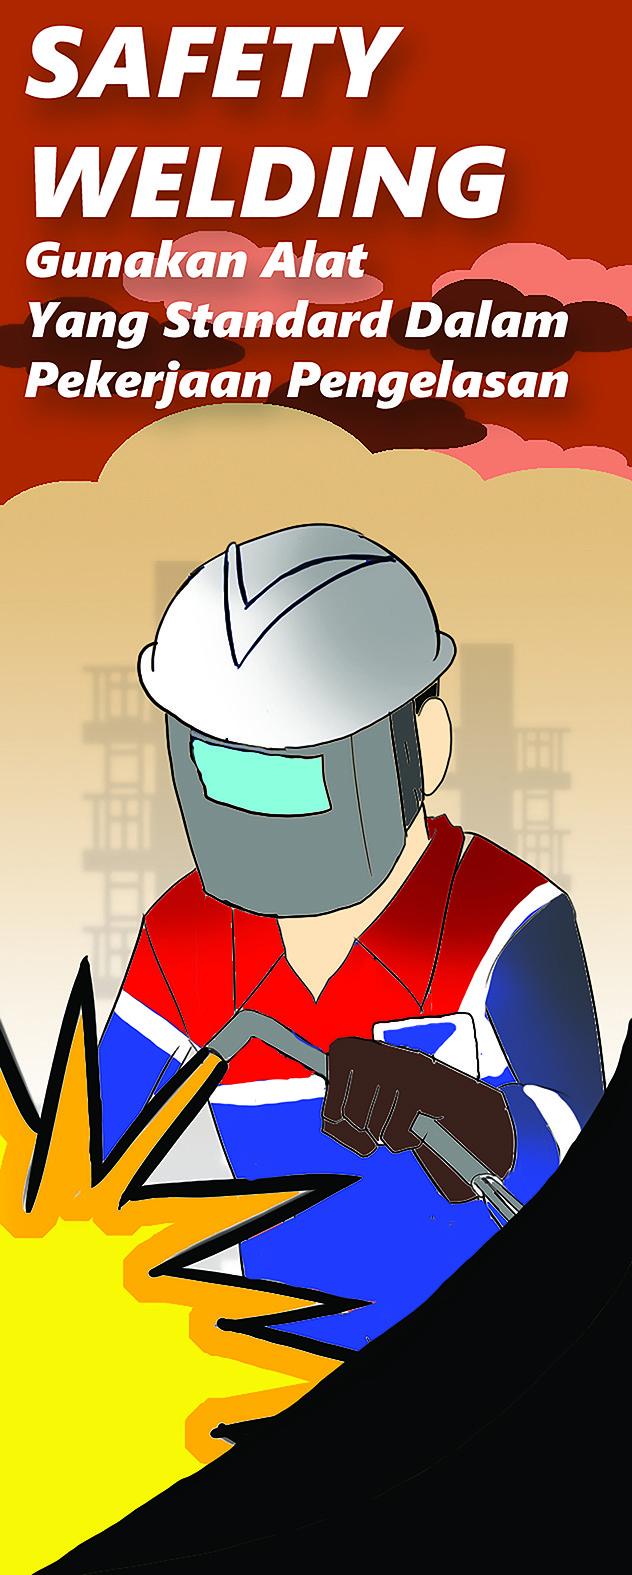 Putra wira adhiprajna pertamina safety welding